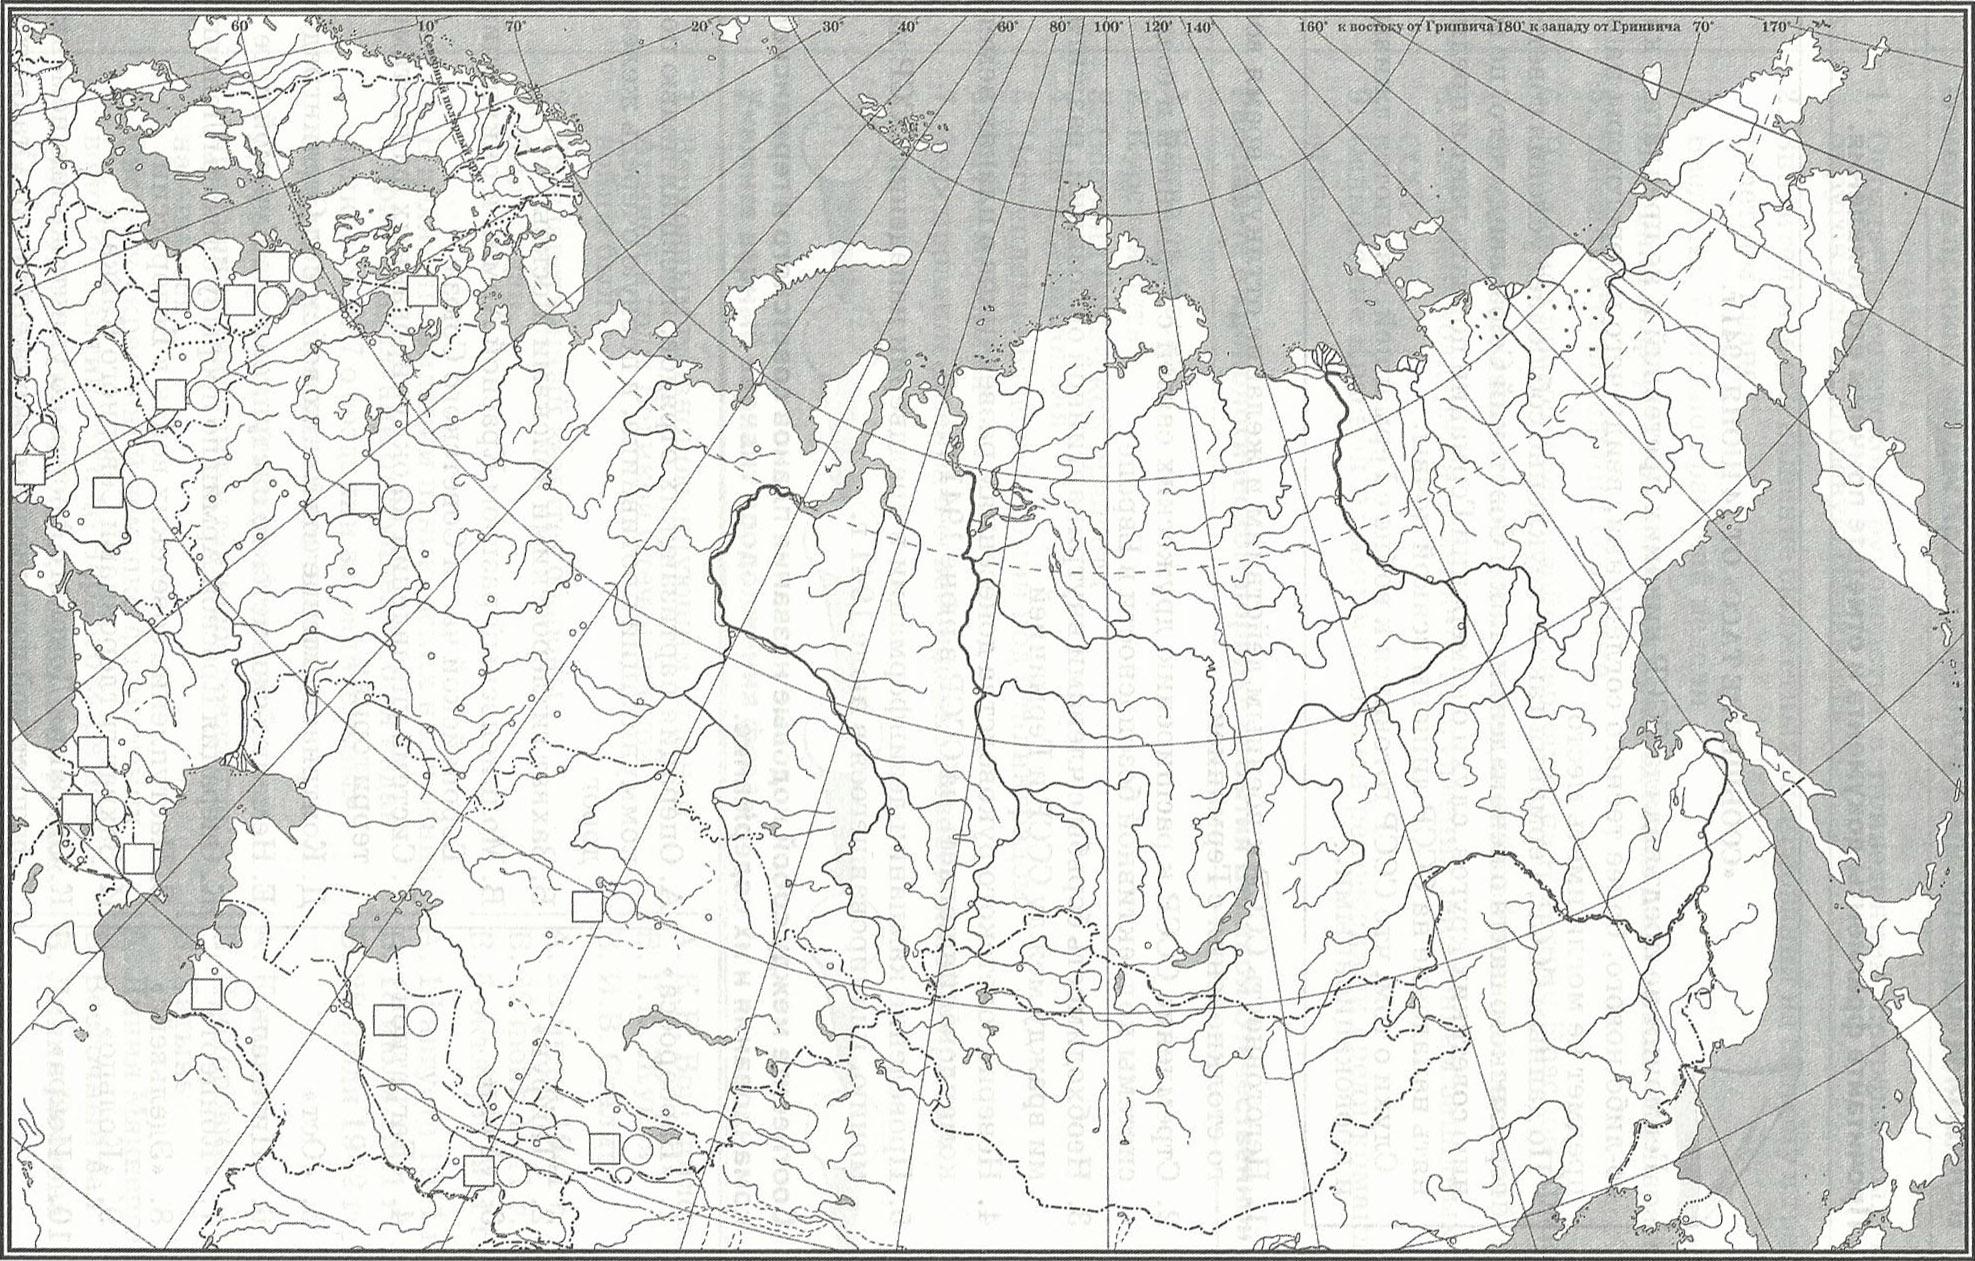 советский союз.jpg